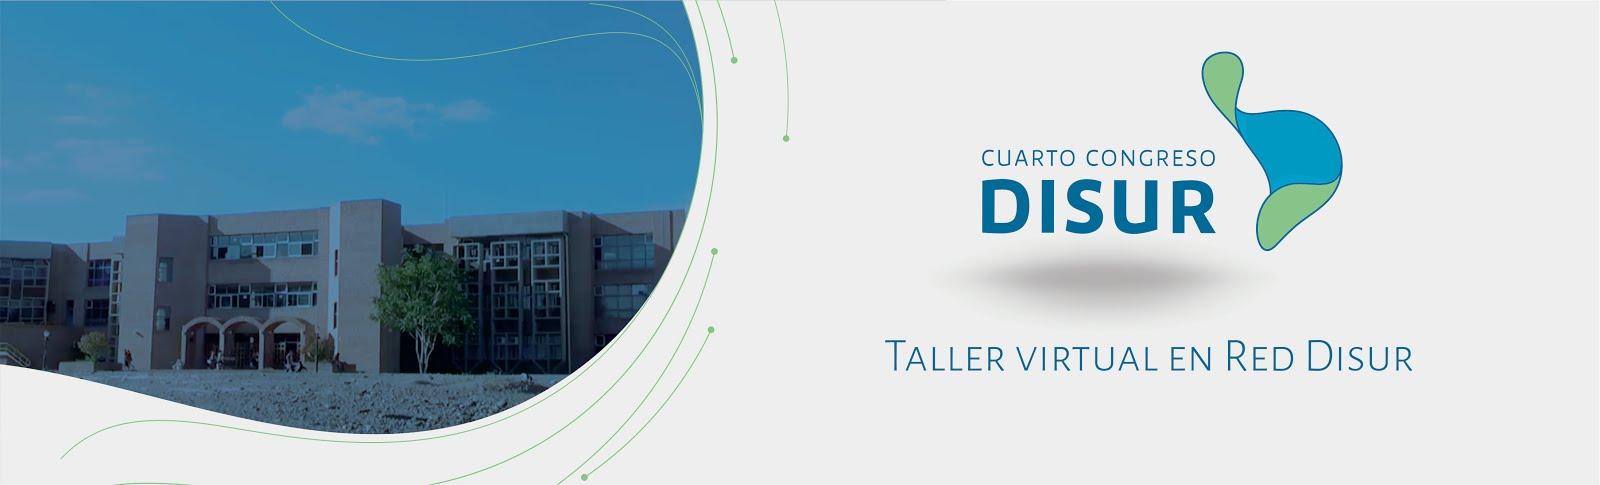 Taller Virtual en Red Disur